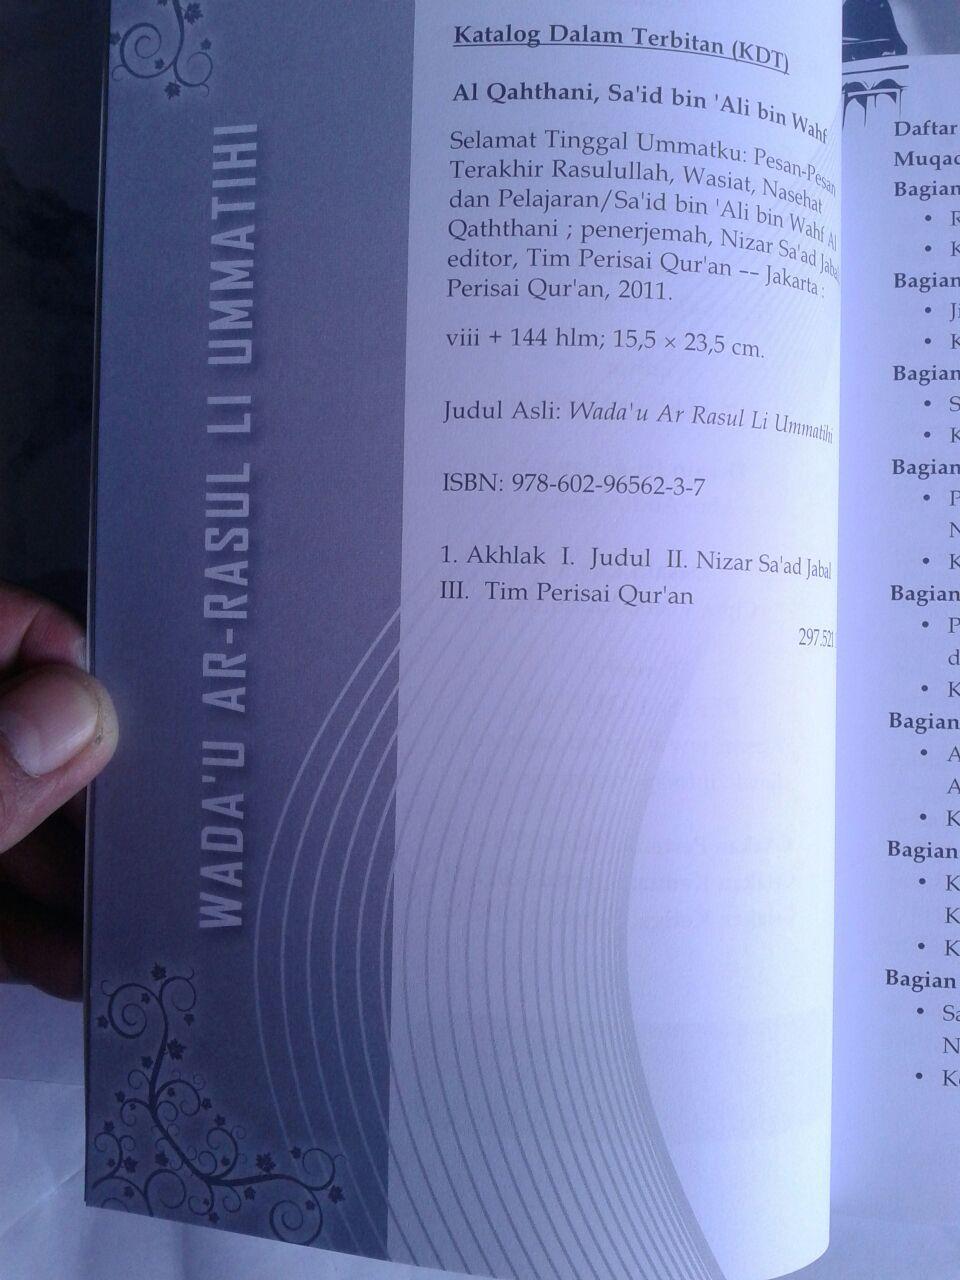 Buku Selamat Tinggal Umatku Pesan Pesan Terakhir Rasulullah isi 3